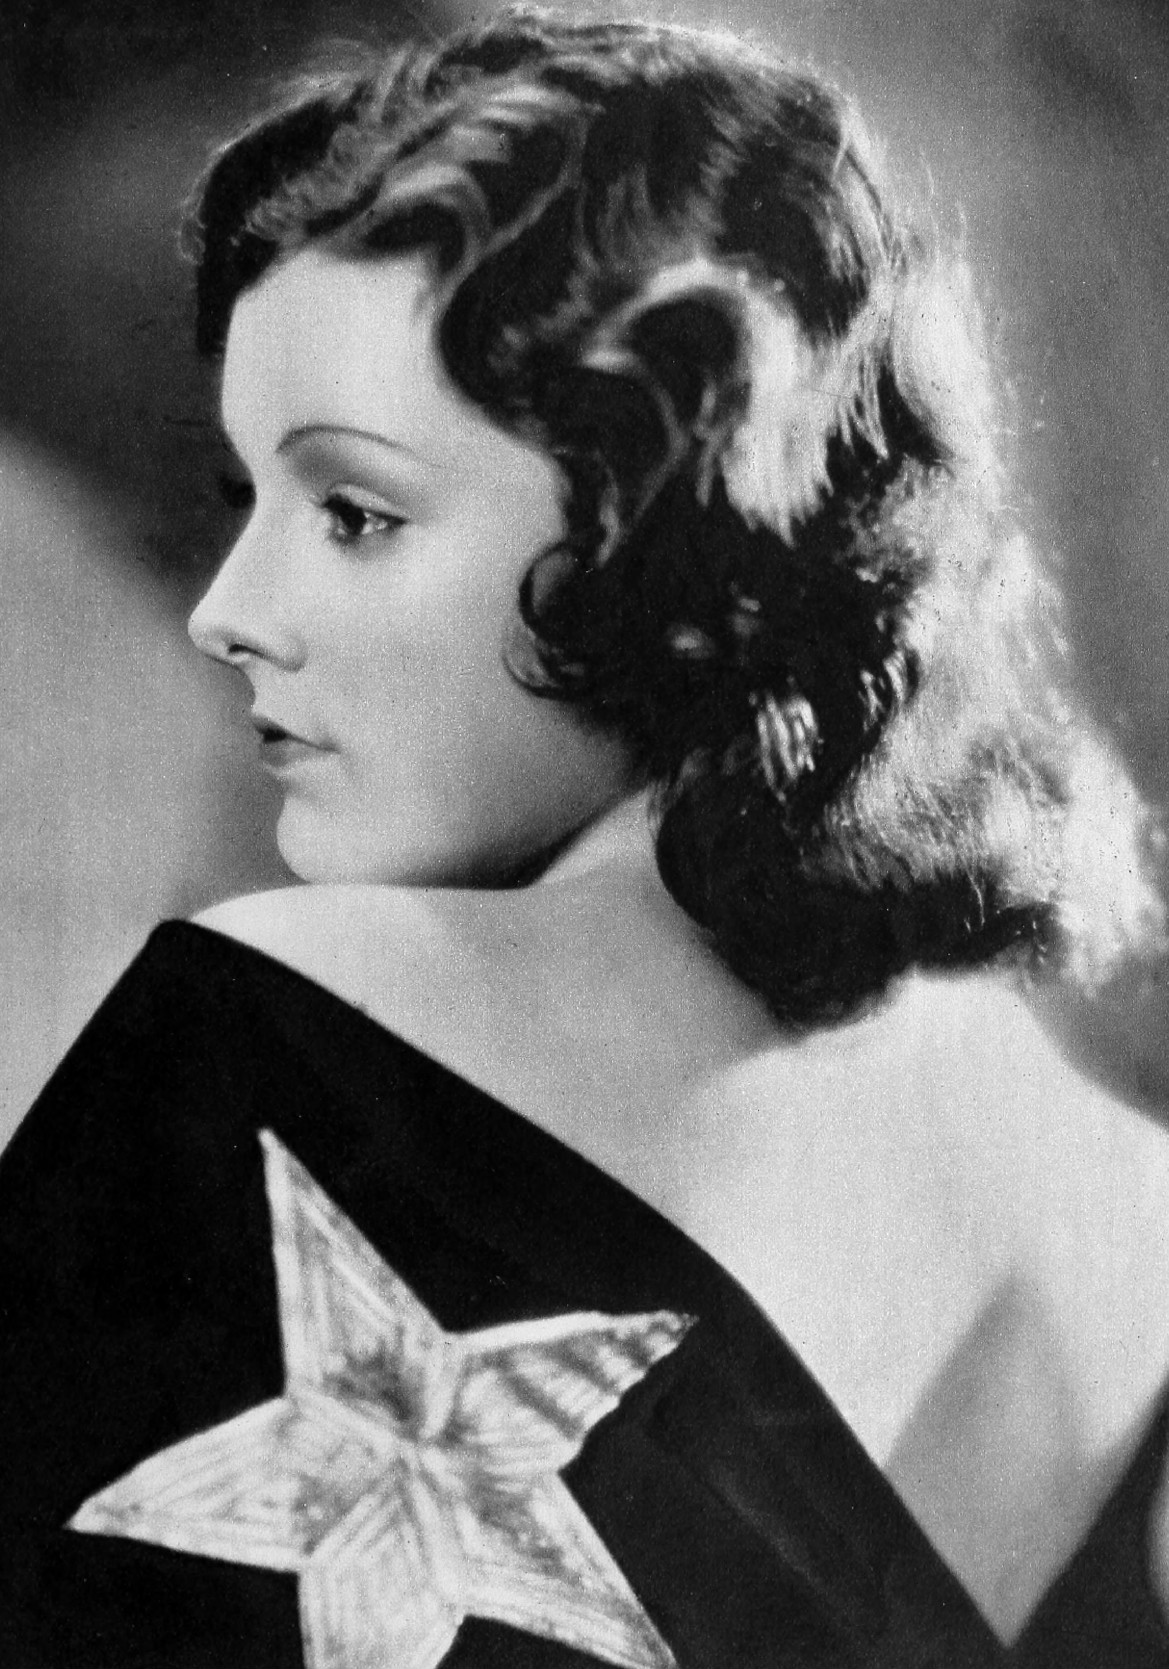 Lillian Roth Lillian Roth Wikipedia the free encyclopedia